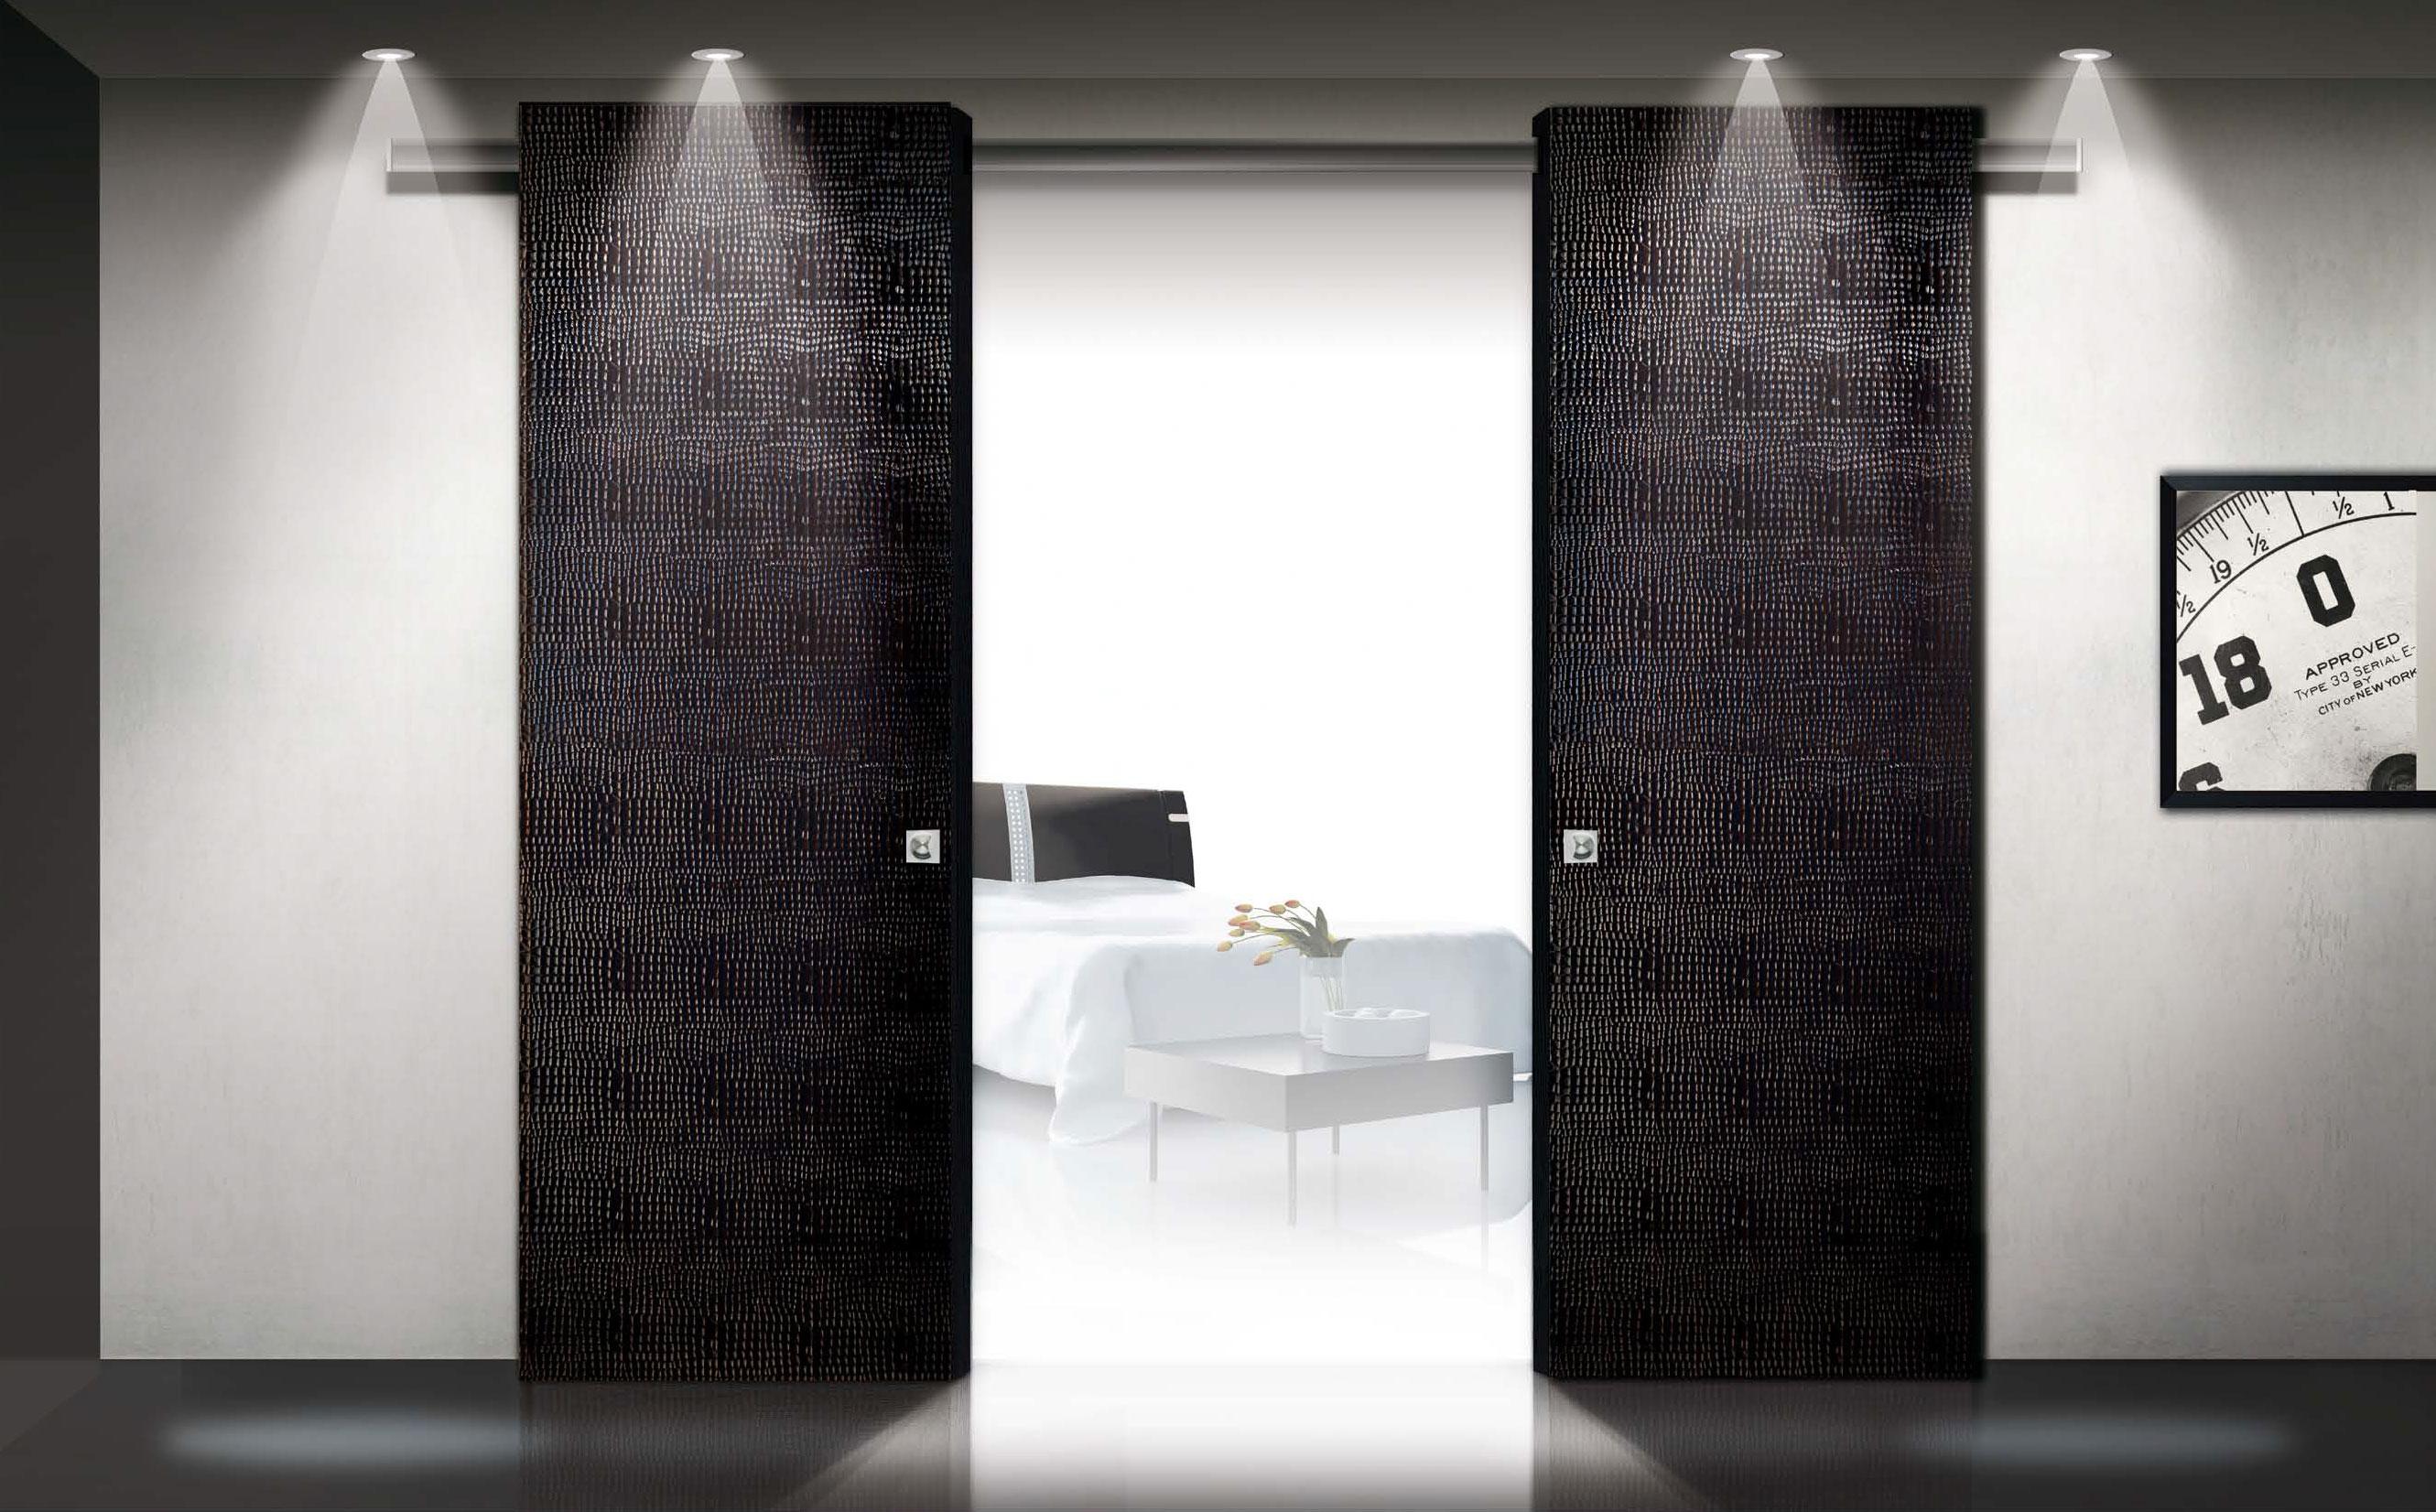 Porte scorrevoli - Porte scorrevoli vetro esterno muro ...